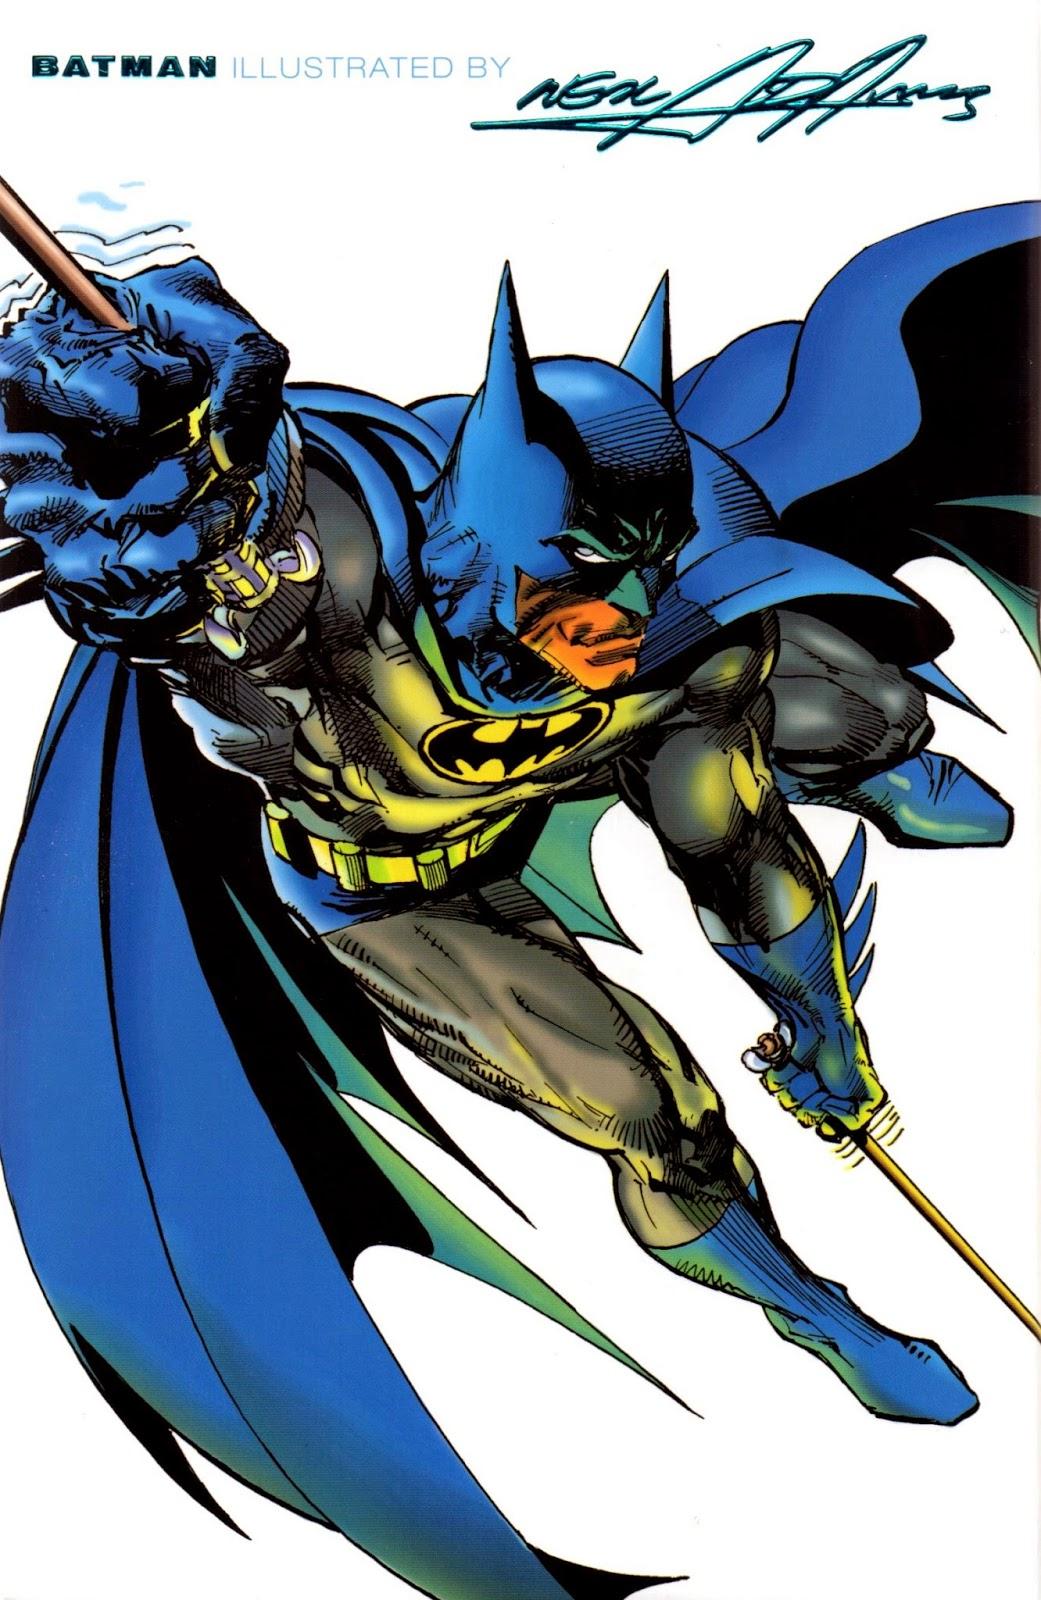 CRIVENS! COMICS & STUFF: AGAIN...NEAL ADAMS' BATMAN COVER